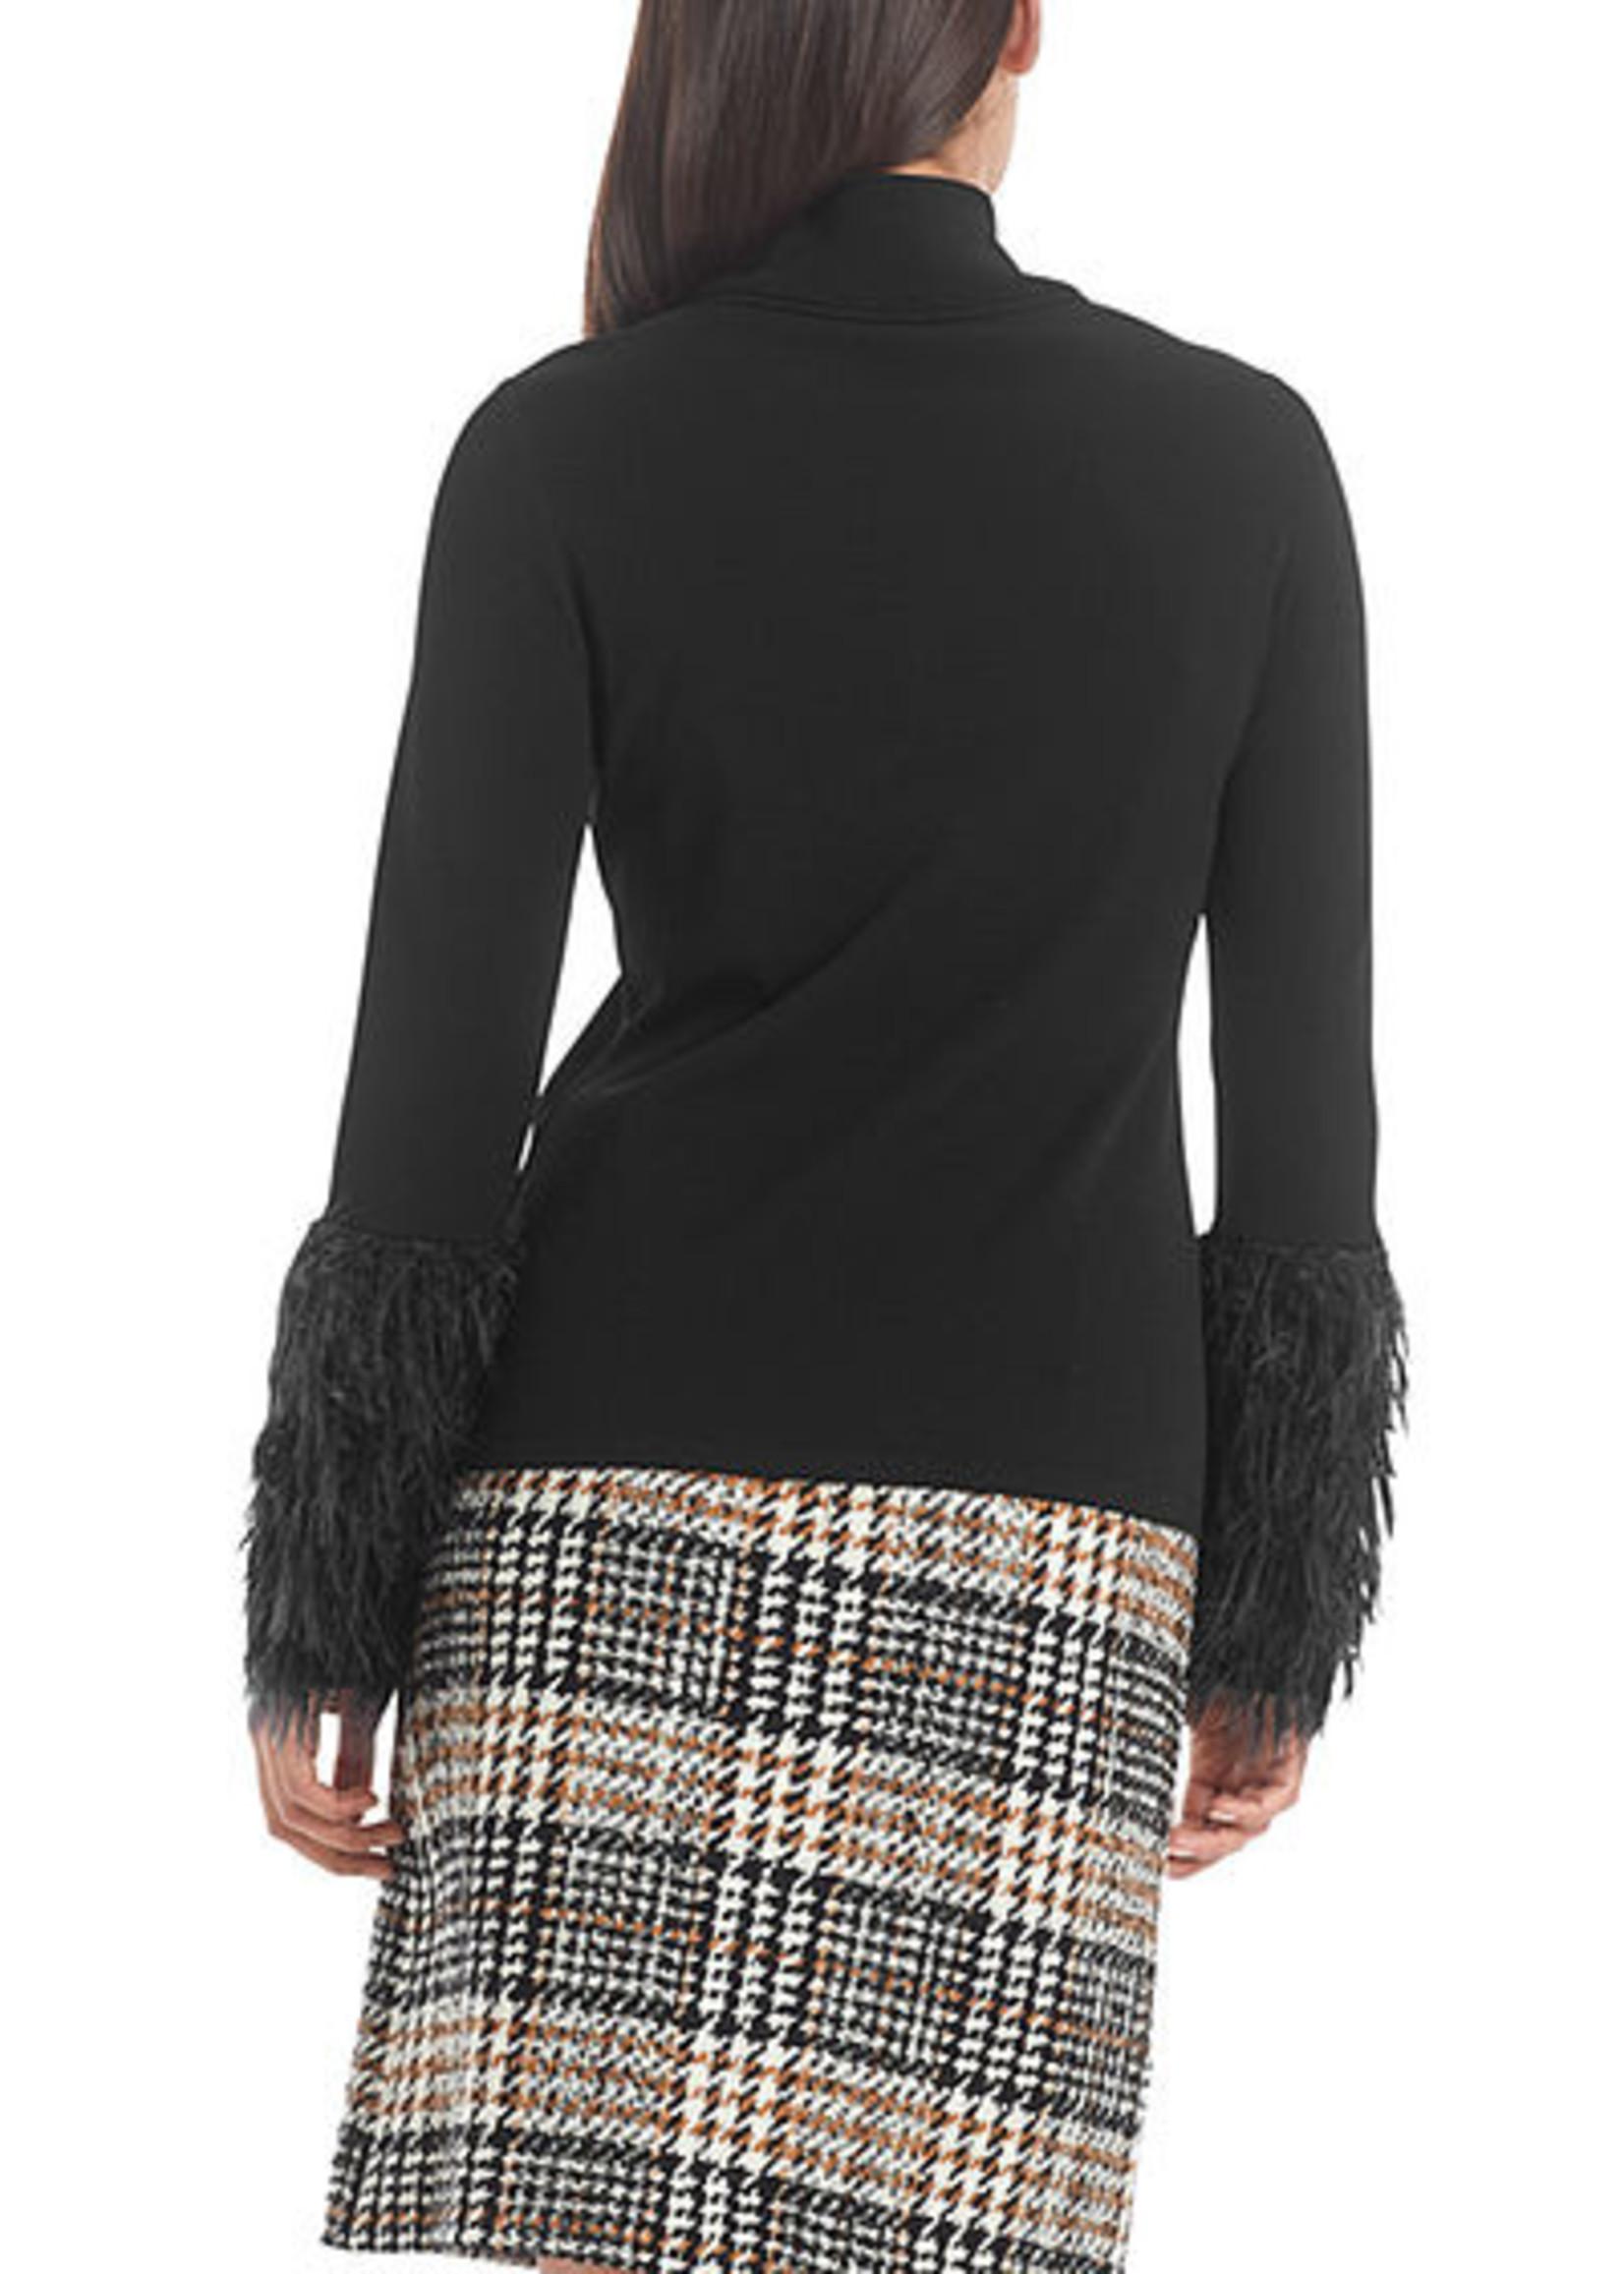 Sweater RC 41.61 M69 black